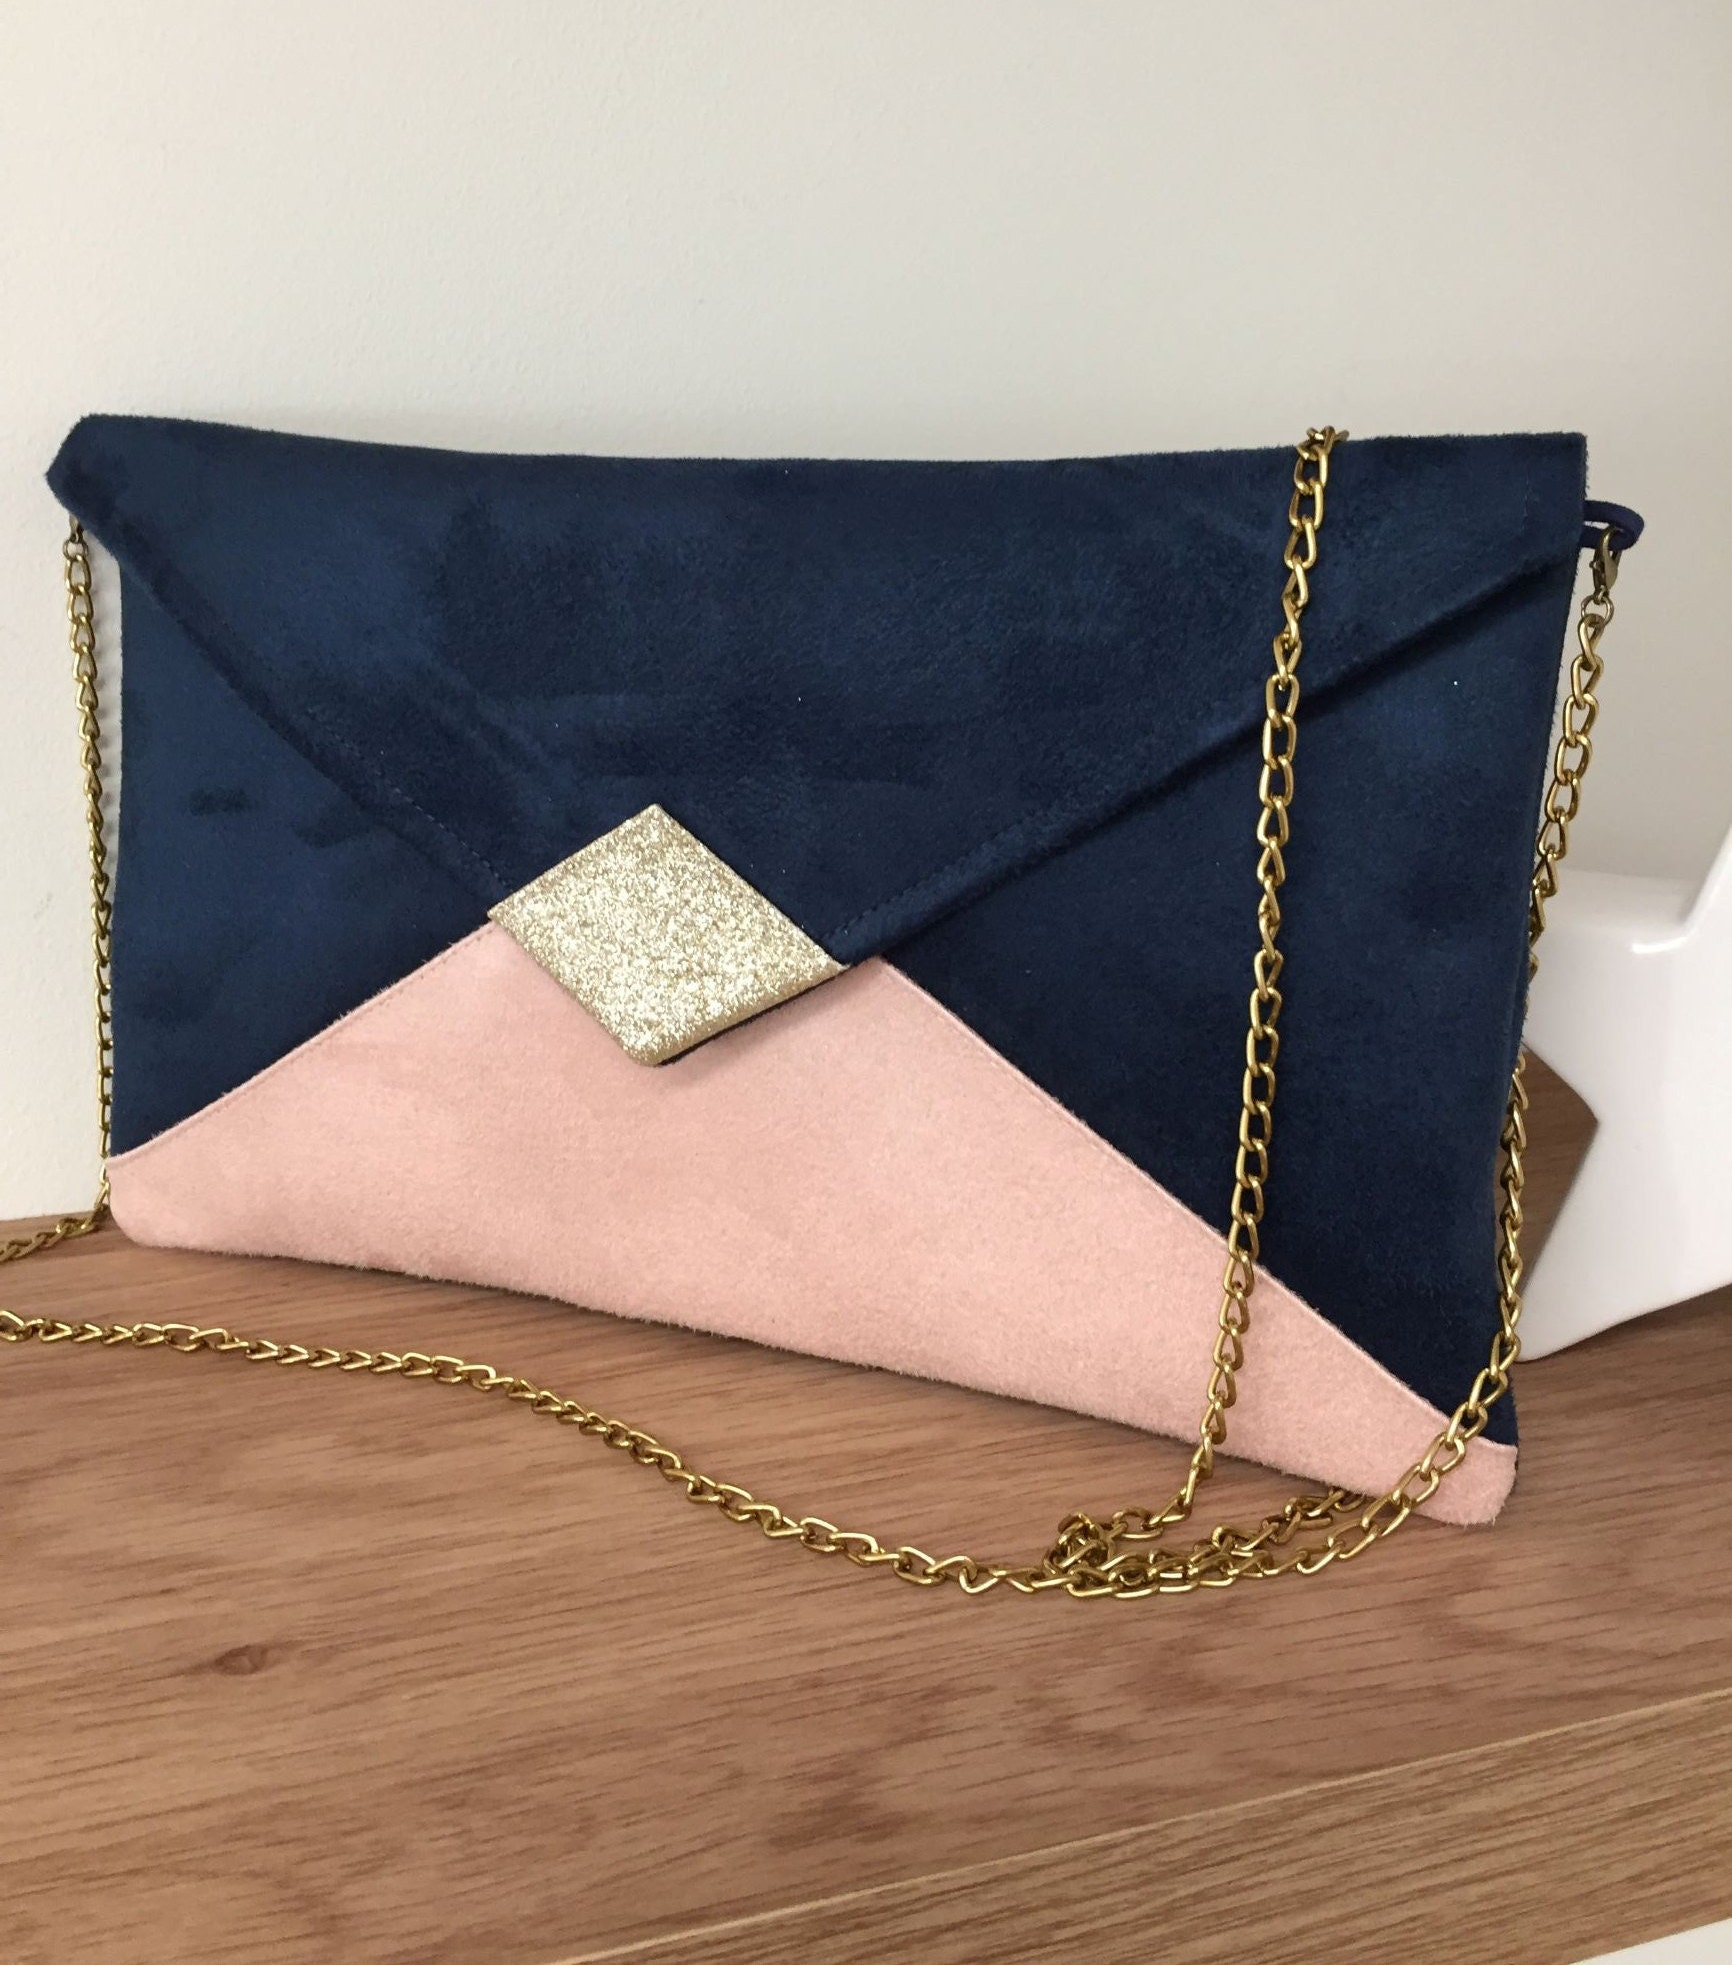 pochette de soir e mariage su dine bleu marine et rose. Black Bedroom Furniture Sets. Home Design Ideas